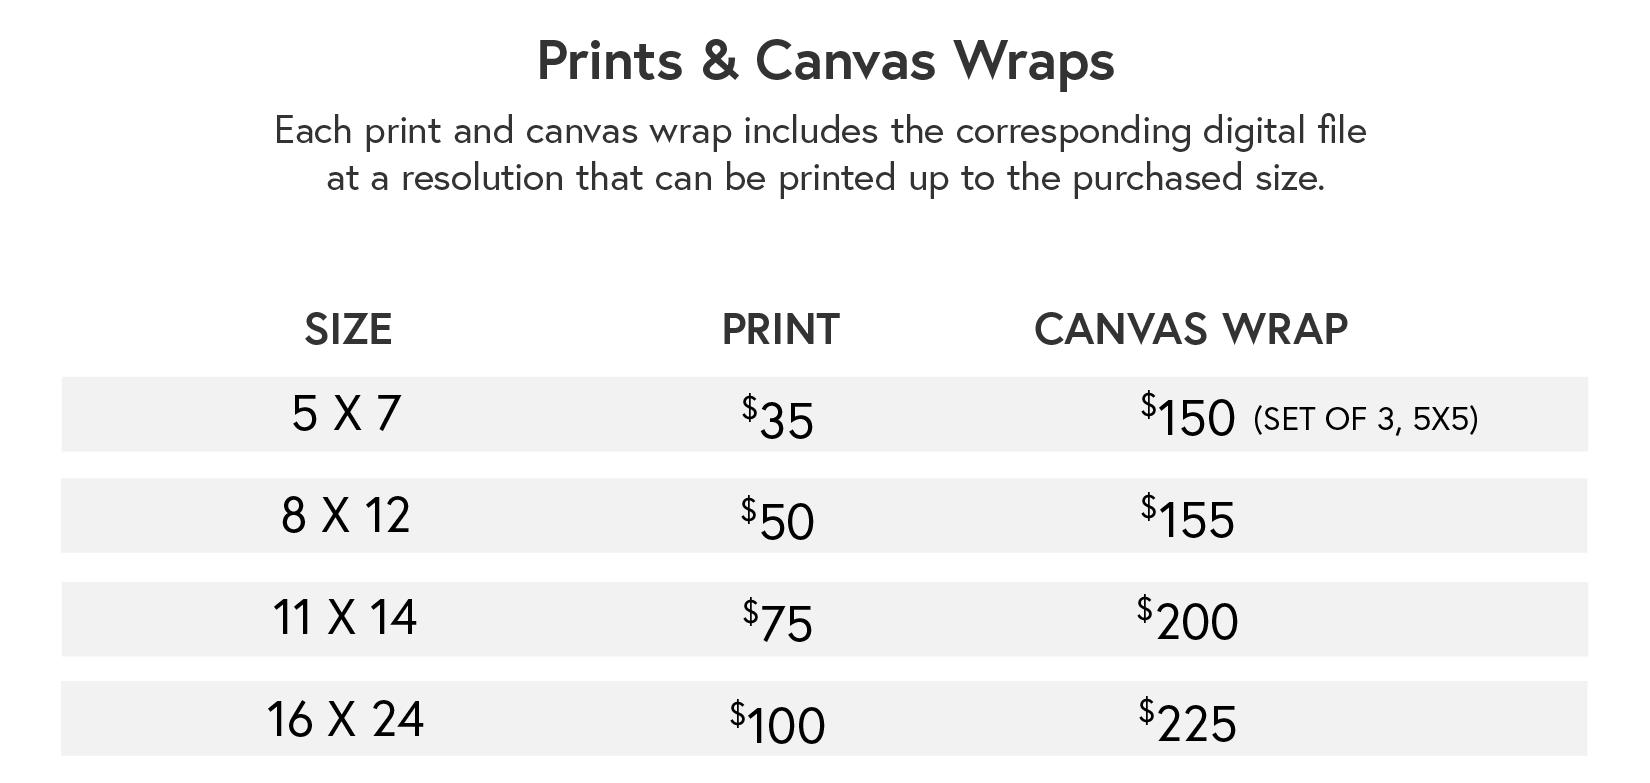 PricingGuide_PrintsCanvasWraps.png